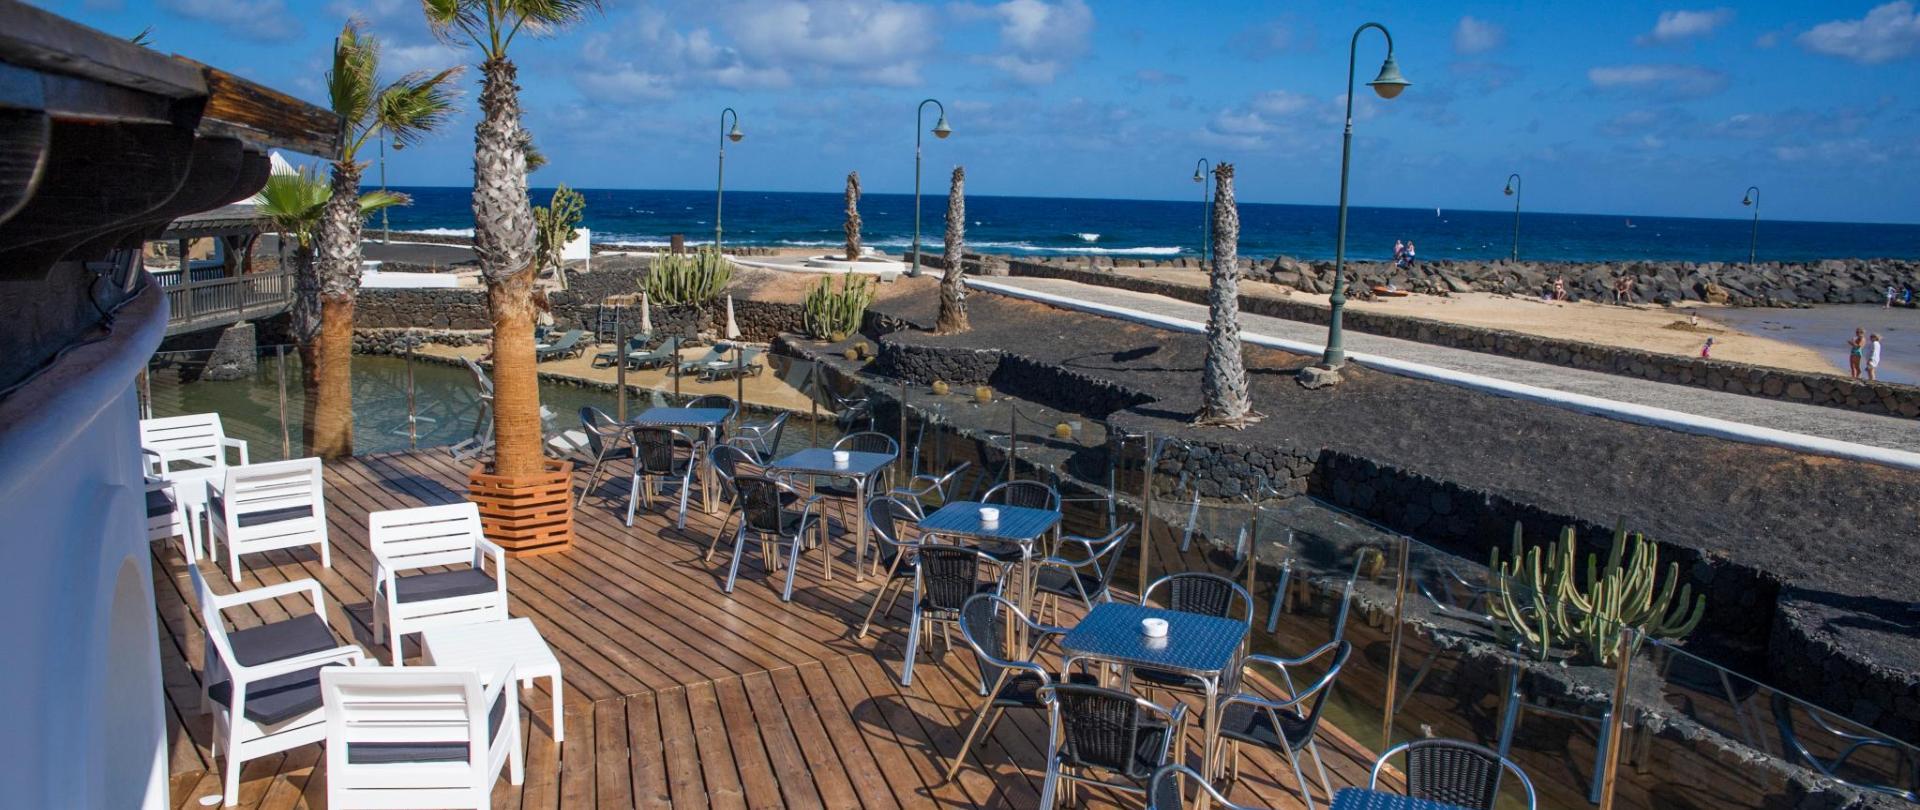 Best views at Lido terrace.jpg